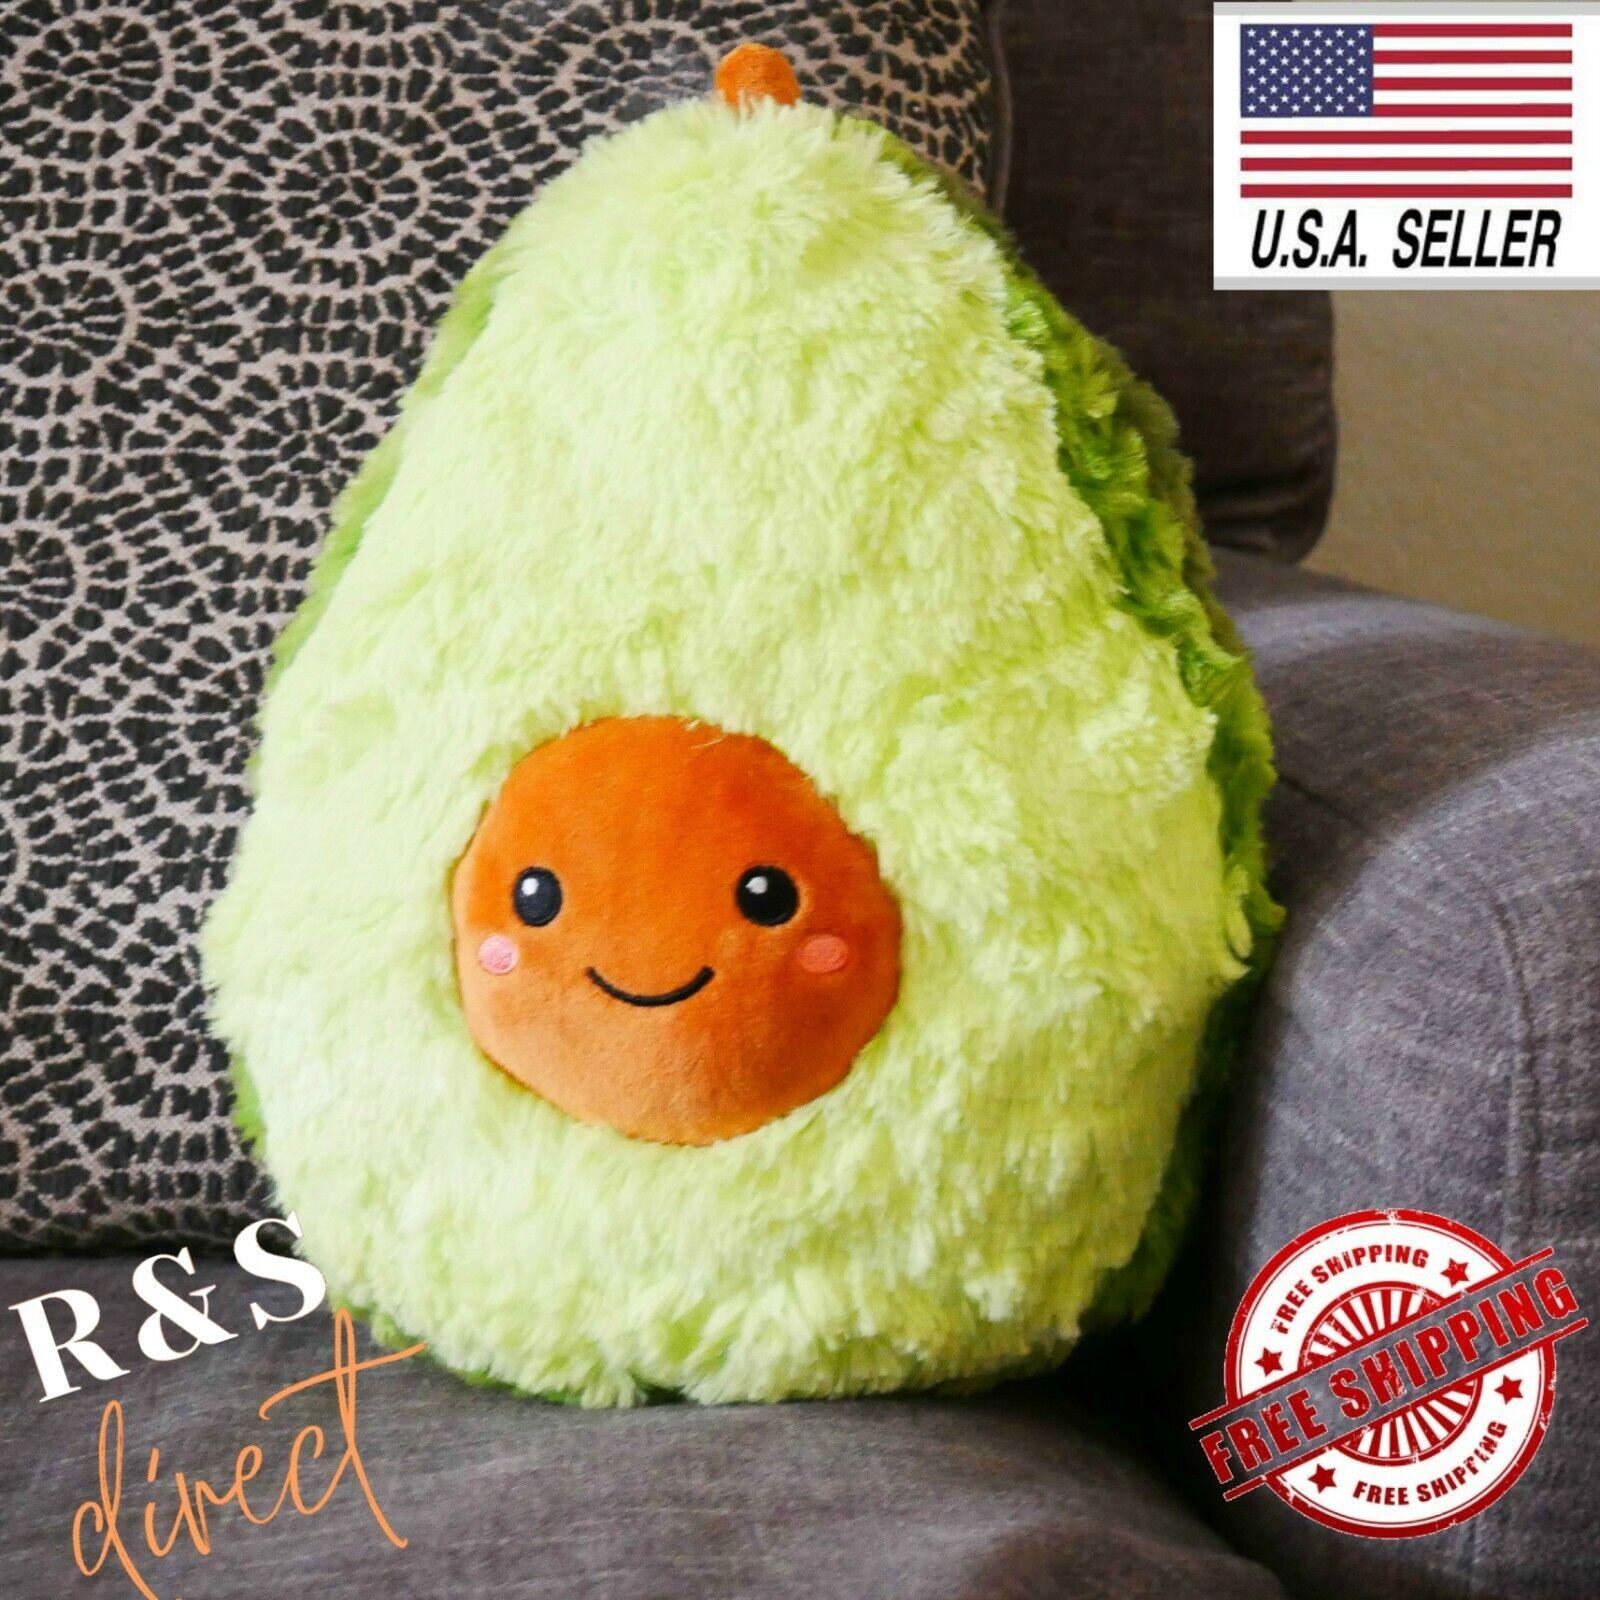 "Cute 12"" Stuffed Avocado Plush Toy Super Soft and Cuddly Pil"